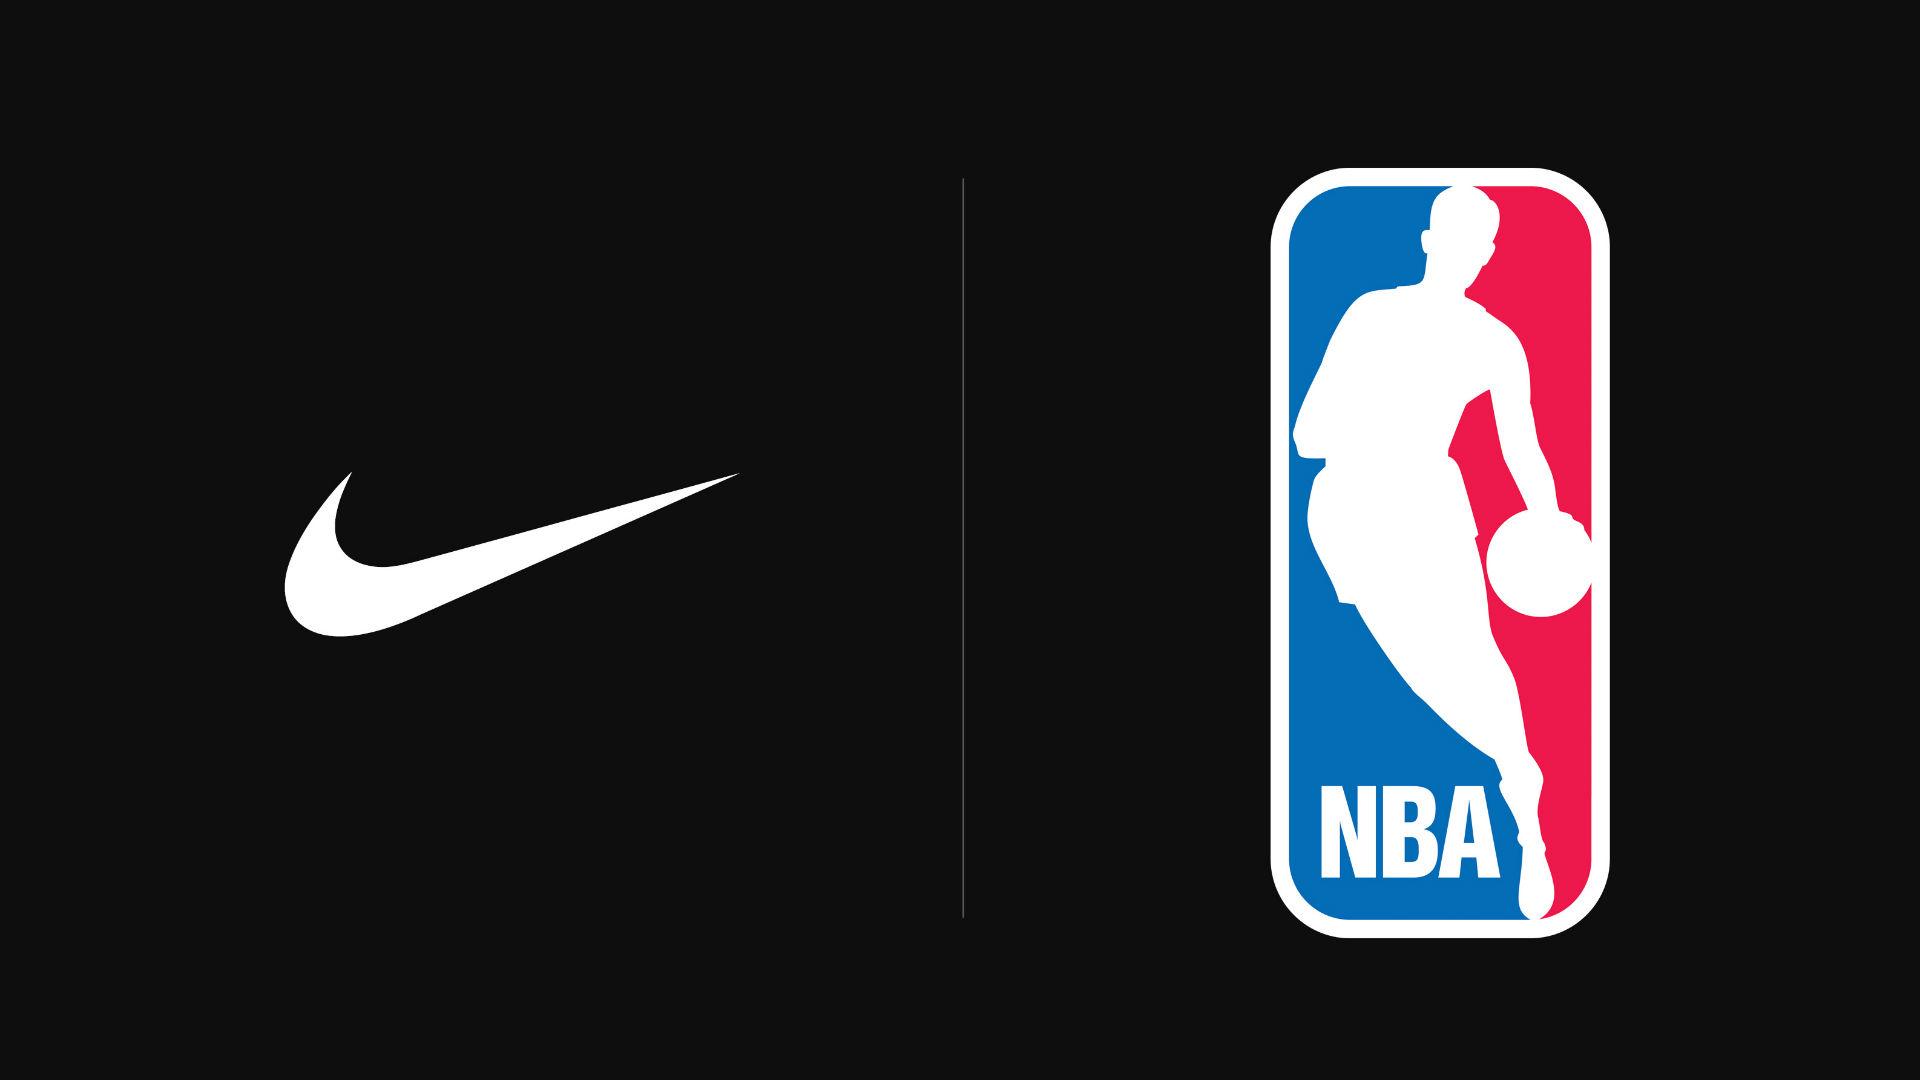 five predictions for nba s new nike deal nba sporting news rh sportingnews com Nike Athlete Program Logo Roger Federer Nike Logos